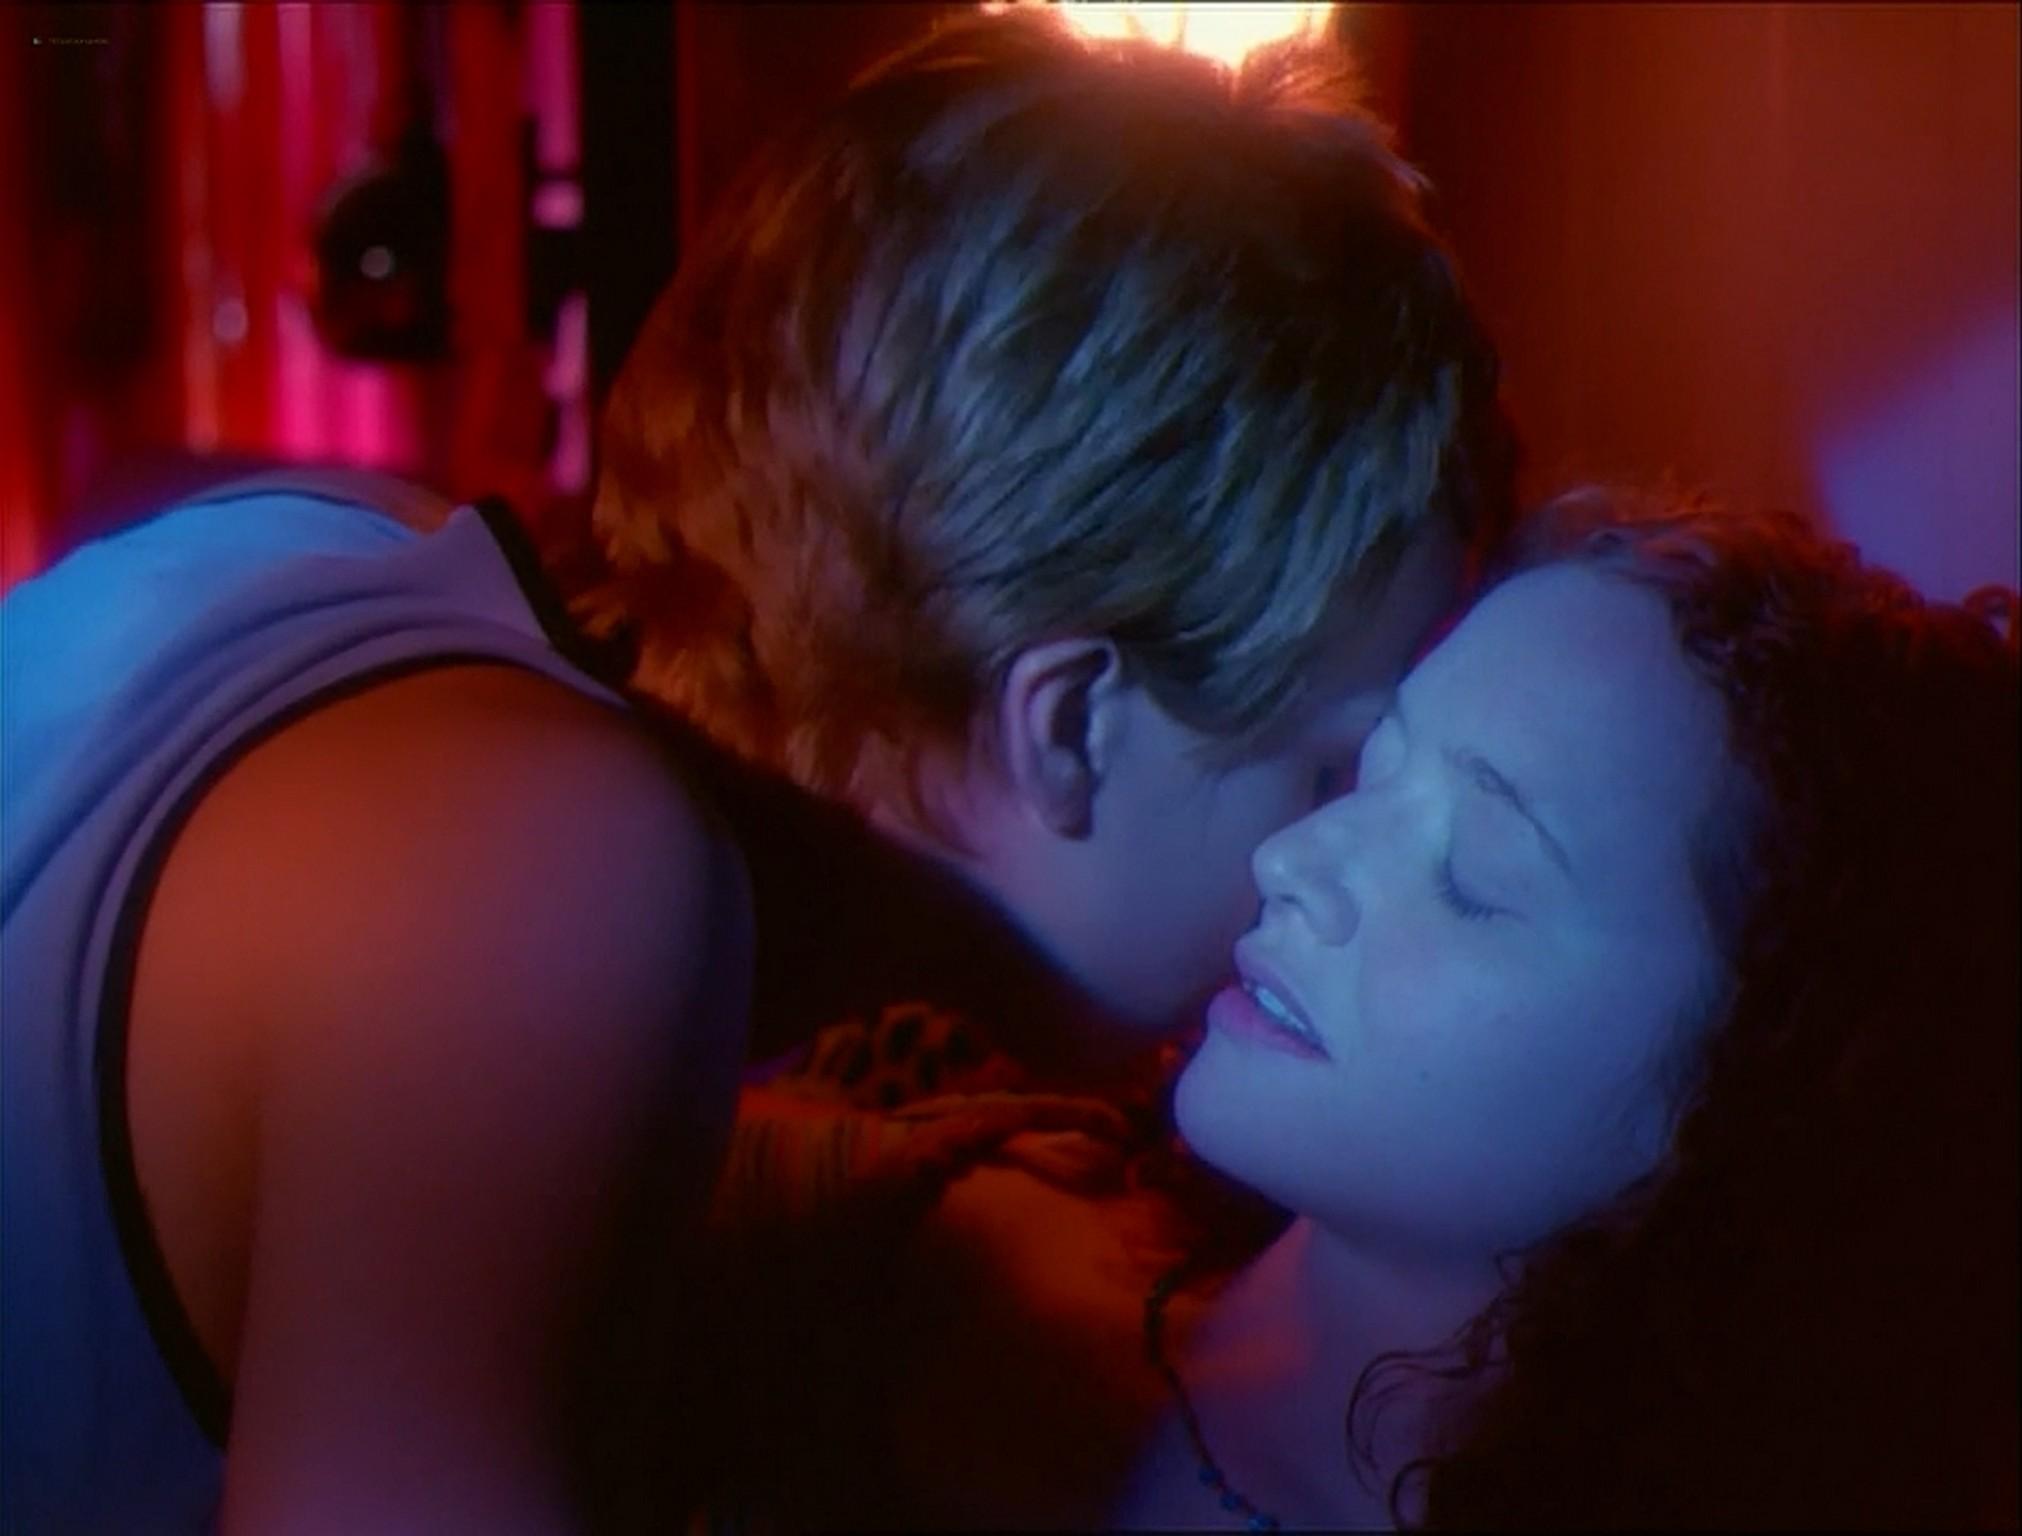 Christina Cox nude bush lesbian sex with Karyn Dwyer nude too Better than Chocolate 1999 HD 720p WEB DL